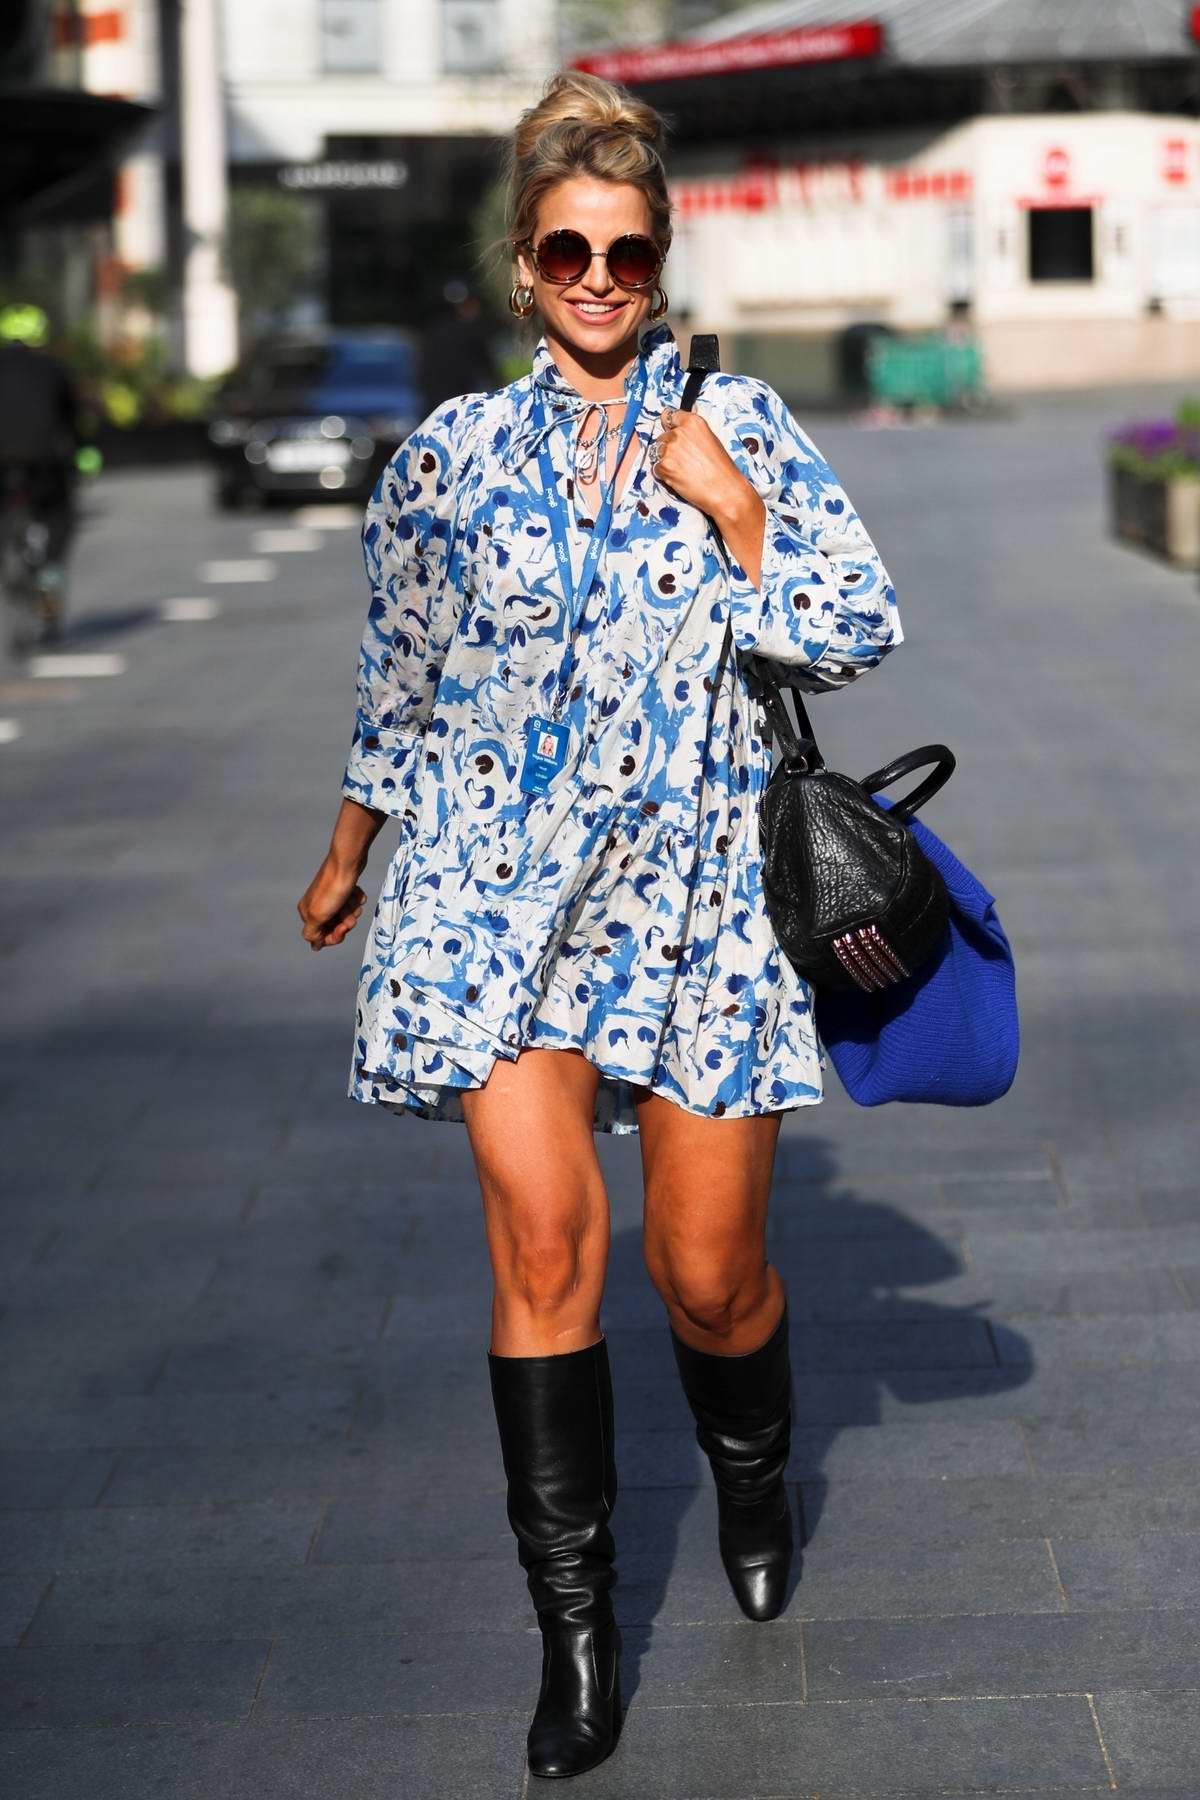 Vogue Williams seen leaving Heart Radio breakfast show in summer dress in London, UK